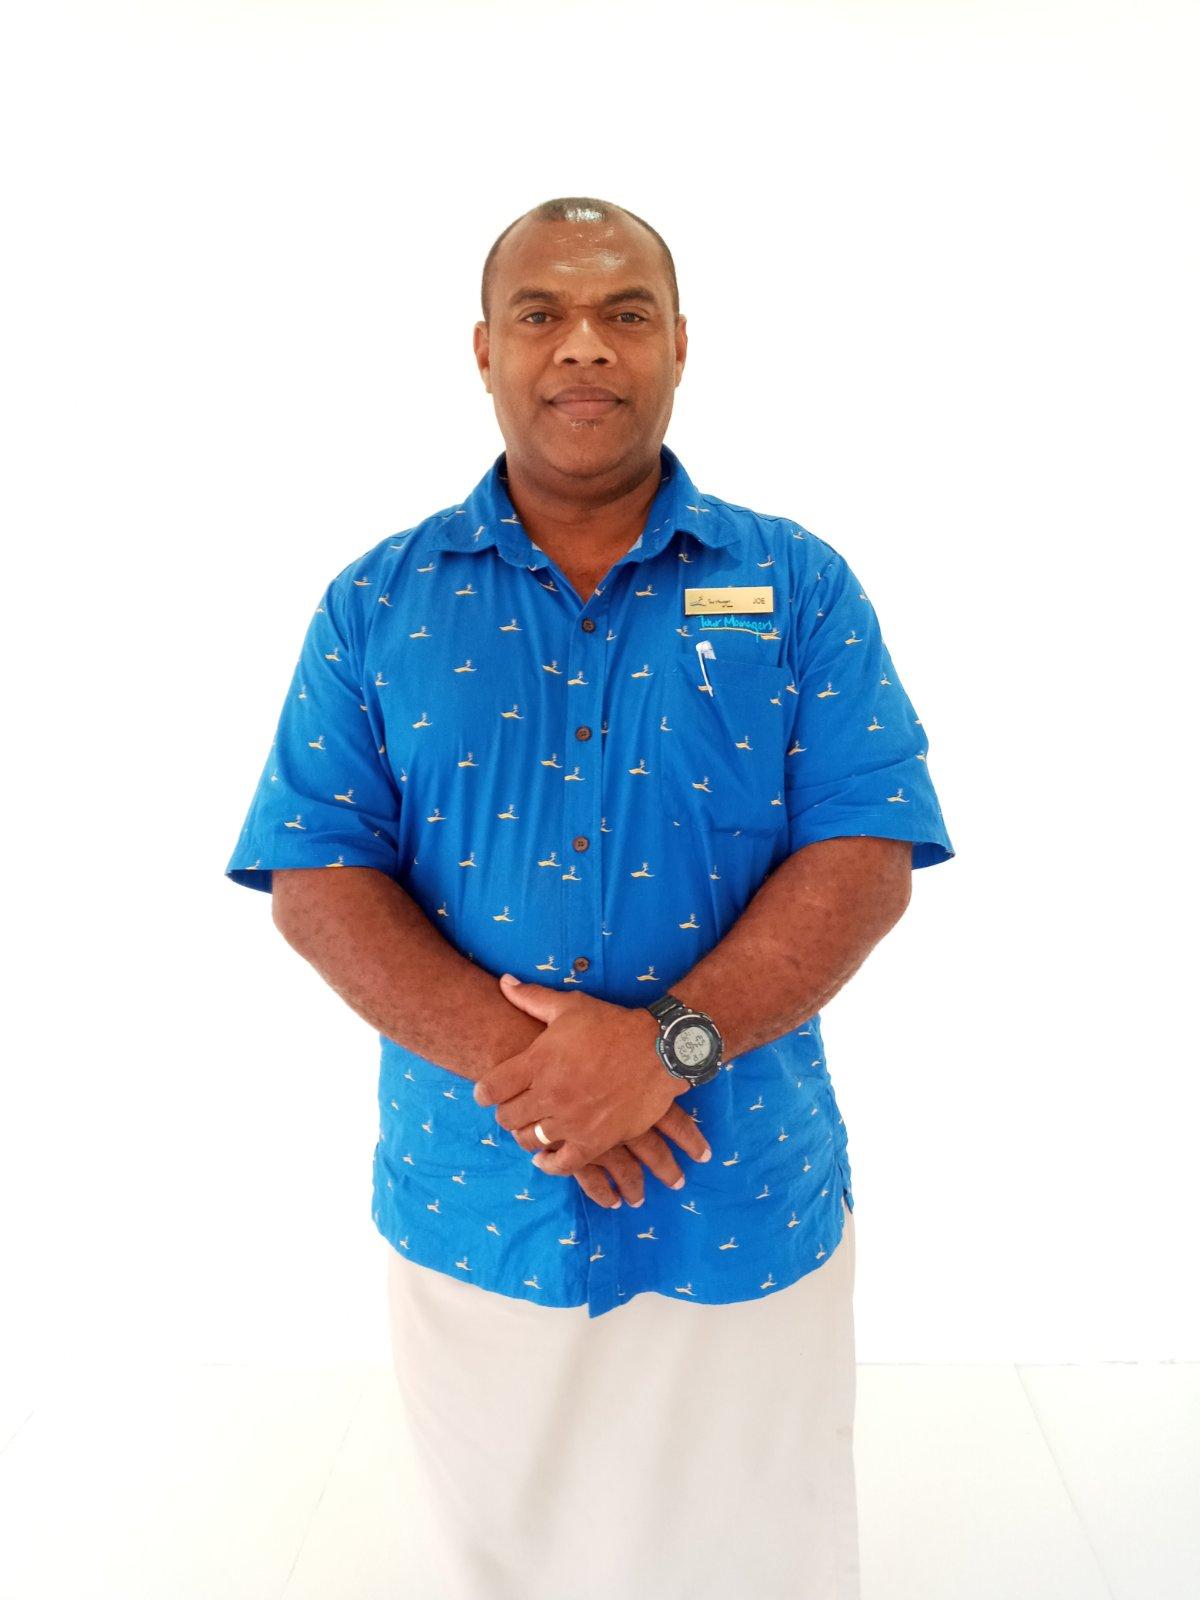 Mr. Joseph Mauitoga